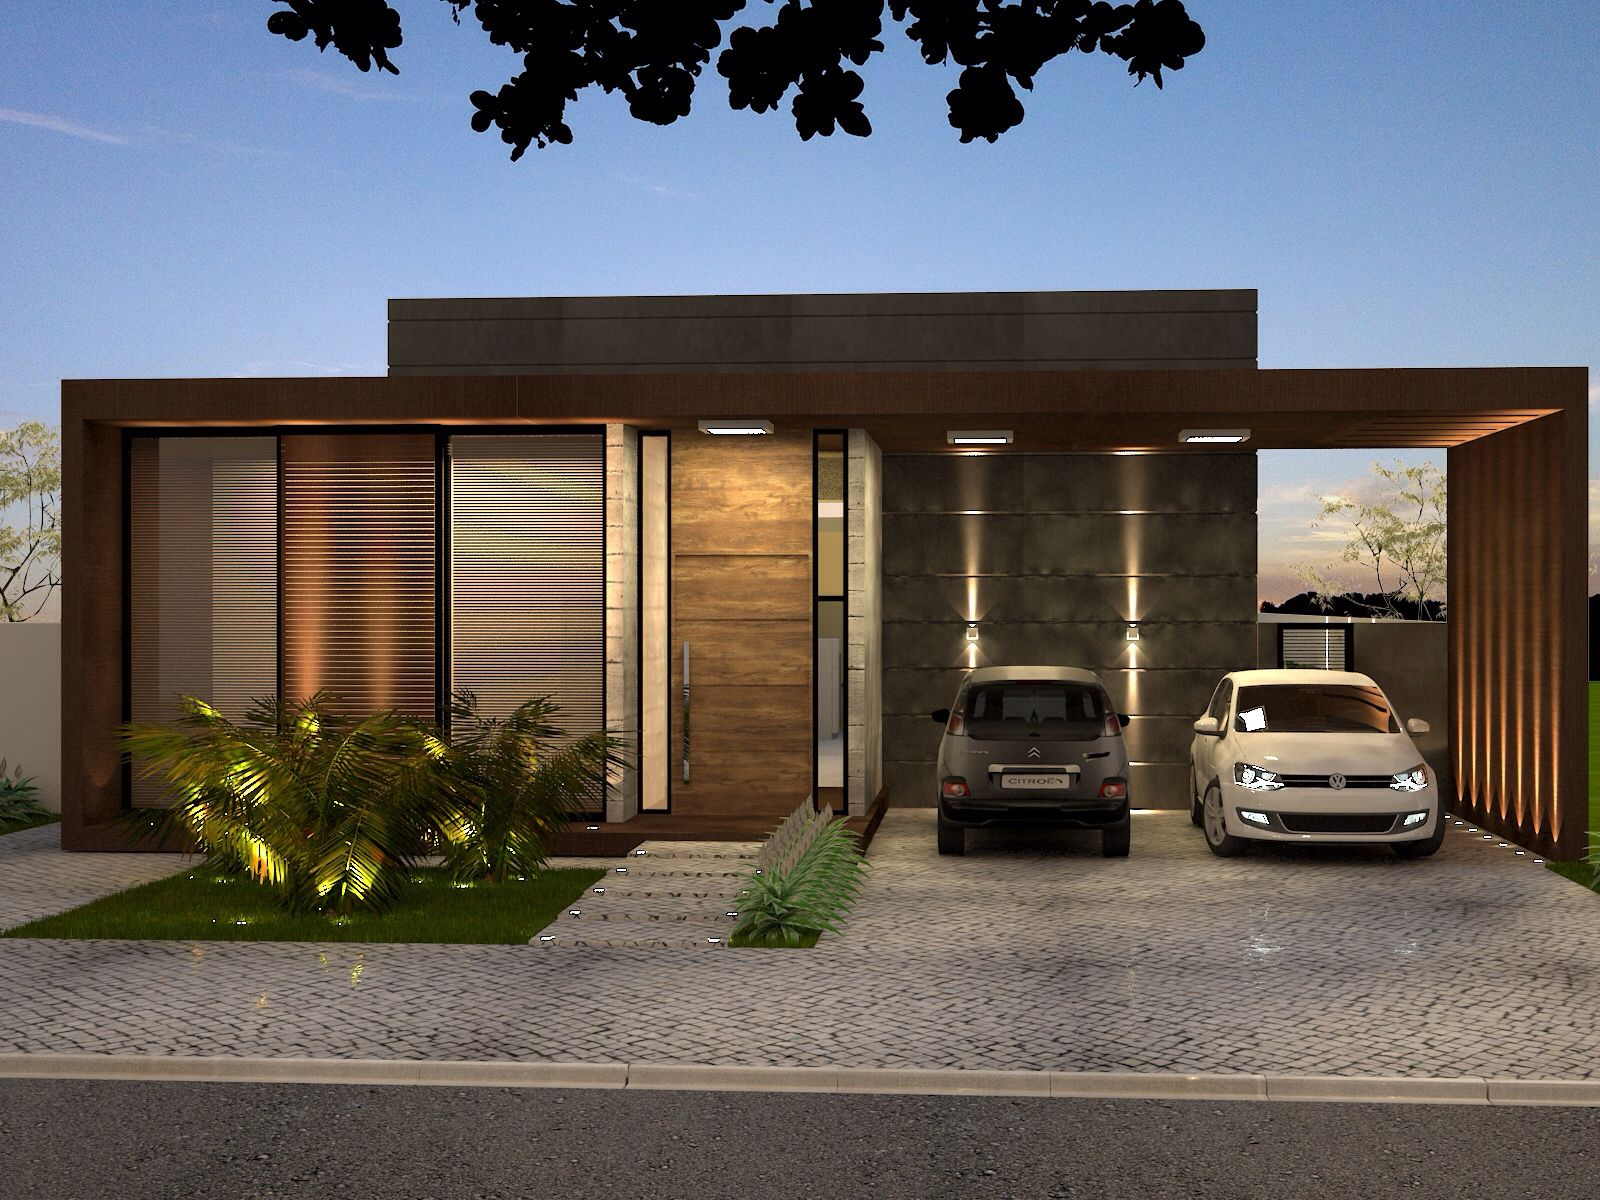 Case Moderne Ad Un Piano : Cómo renovar tu fachada rápidamente te enseñamos tips que harán